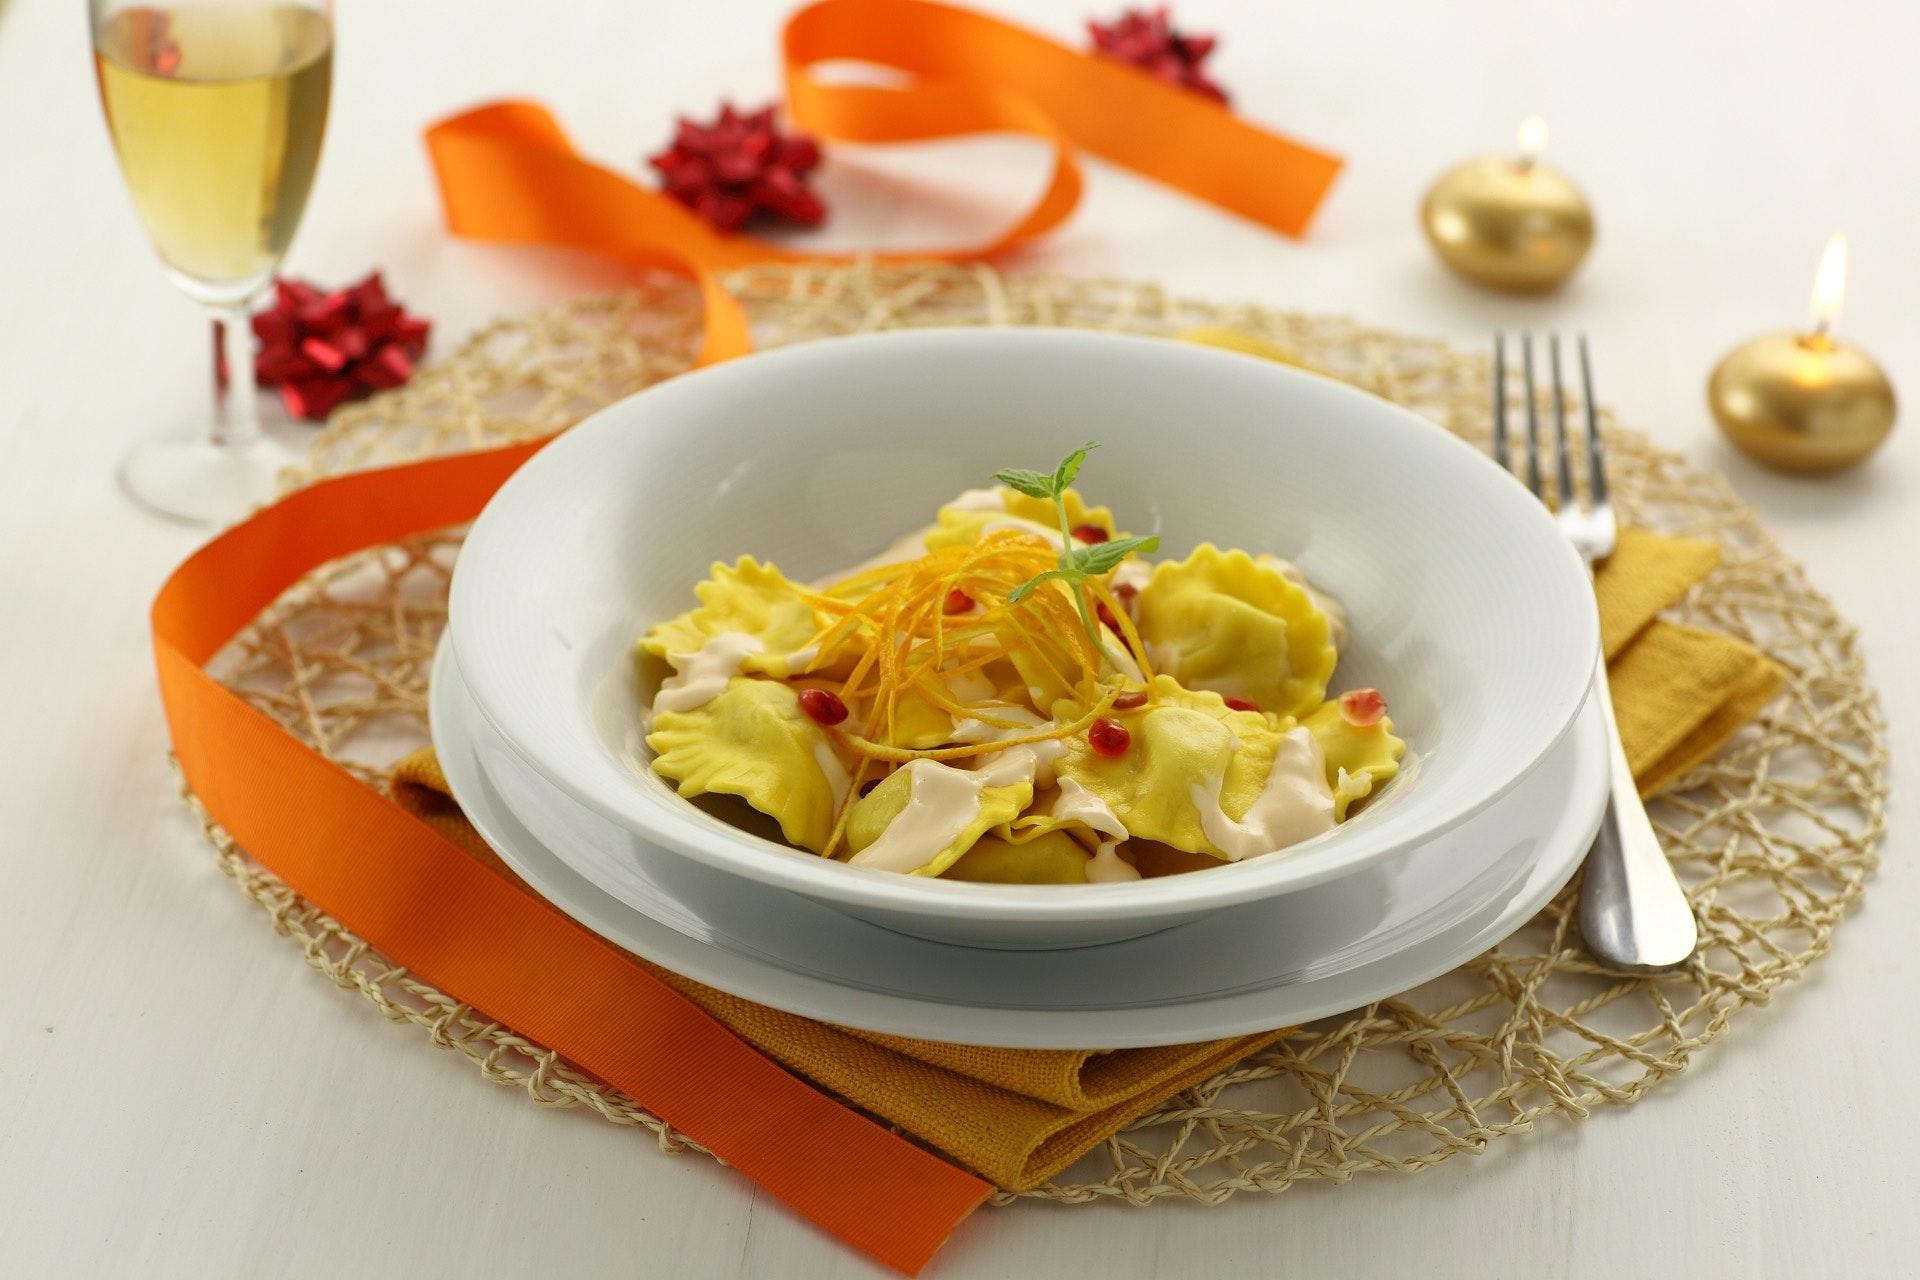 Tortelli ricotta, salmone e arancia - Parmalat